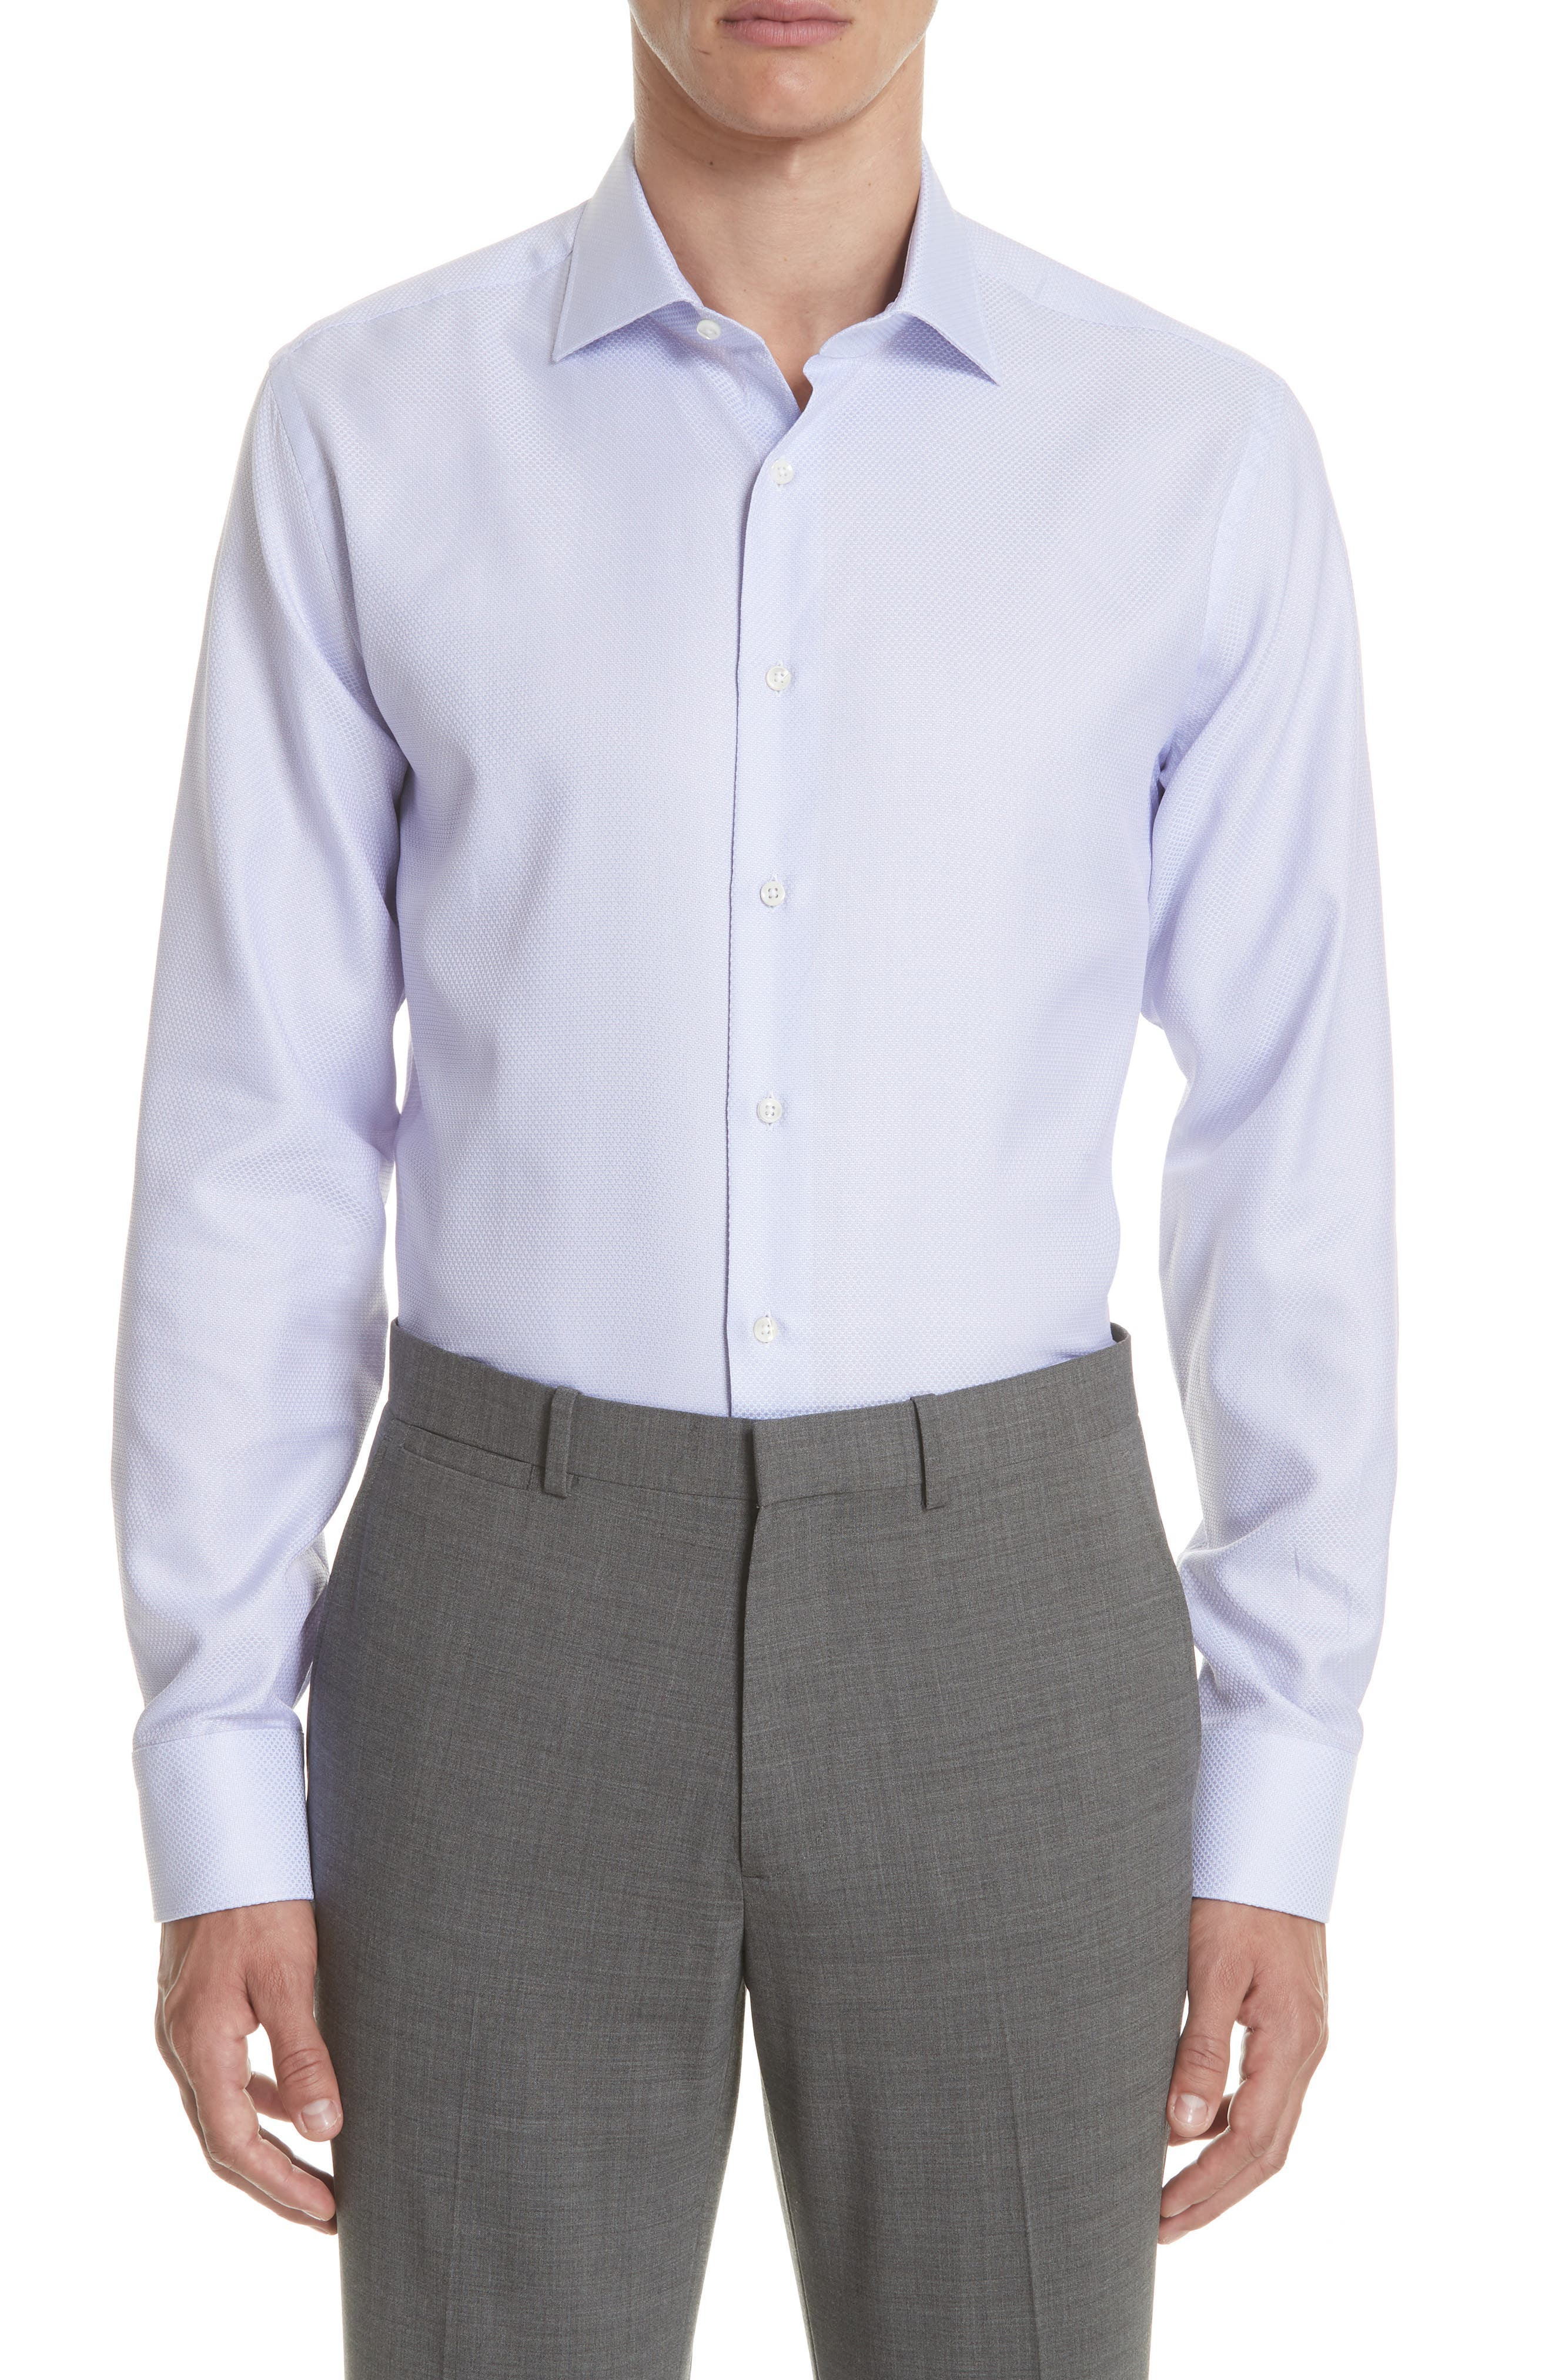 Regular Fit Dress Shirt,                             Main thumbnail 1, color,